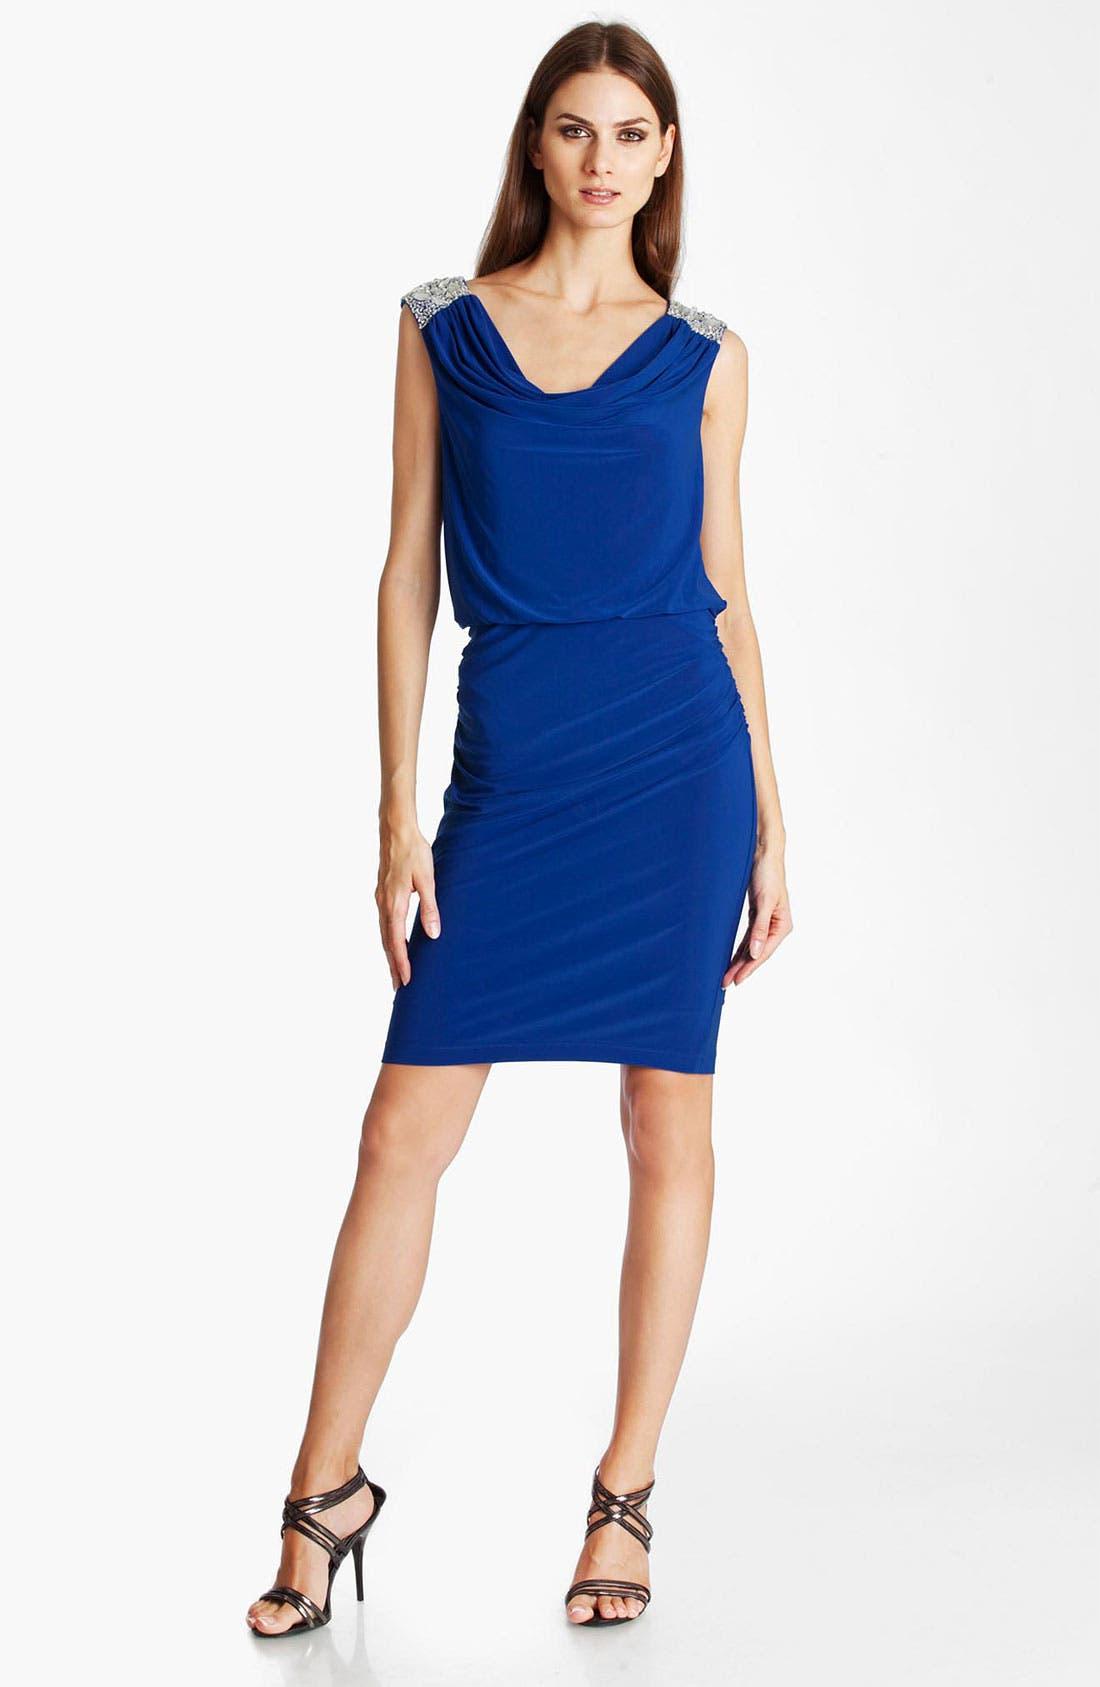 Alternate Image 1 Selected - JS Boutique Jeweled Cowl Neck Blouson Dress